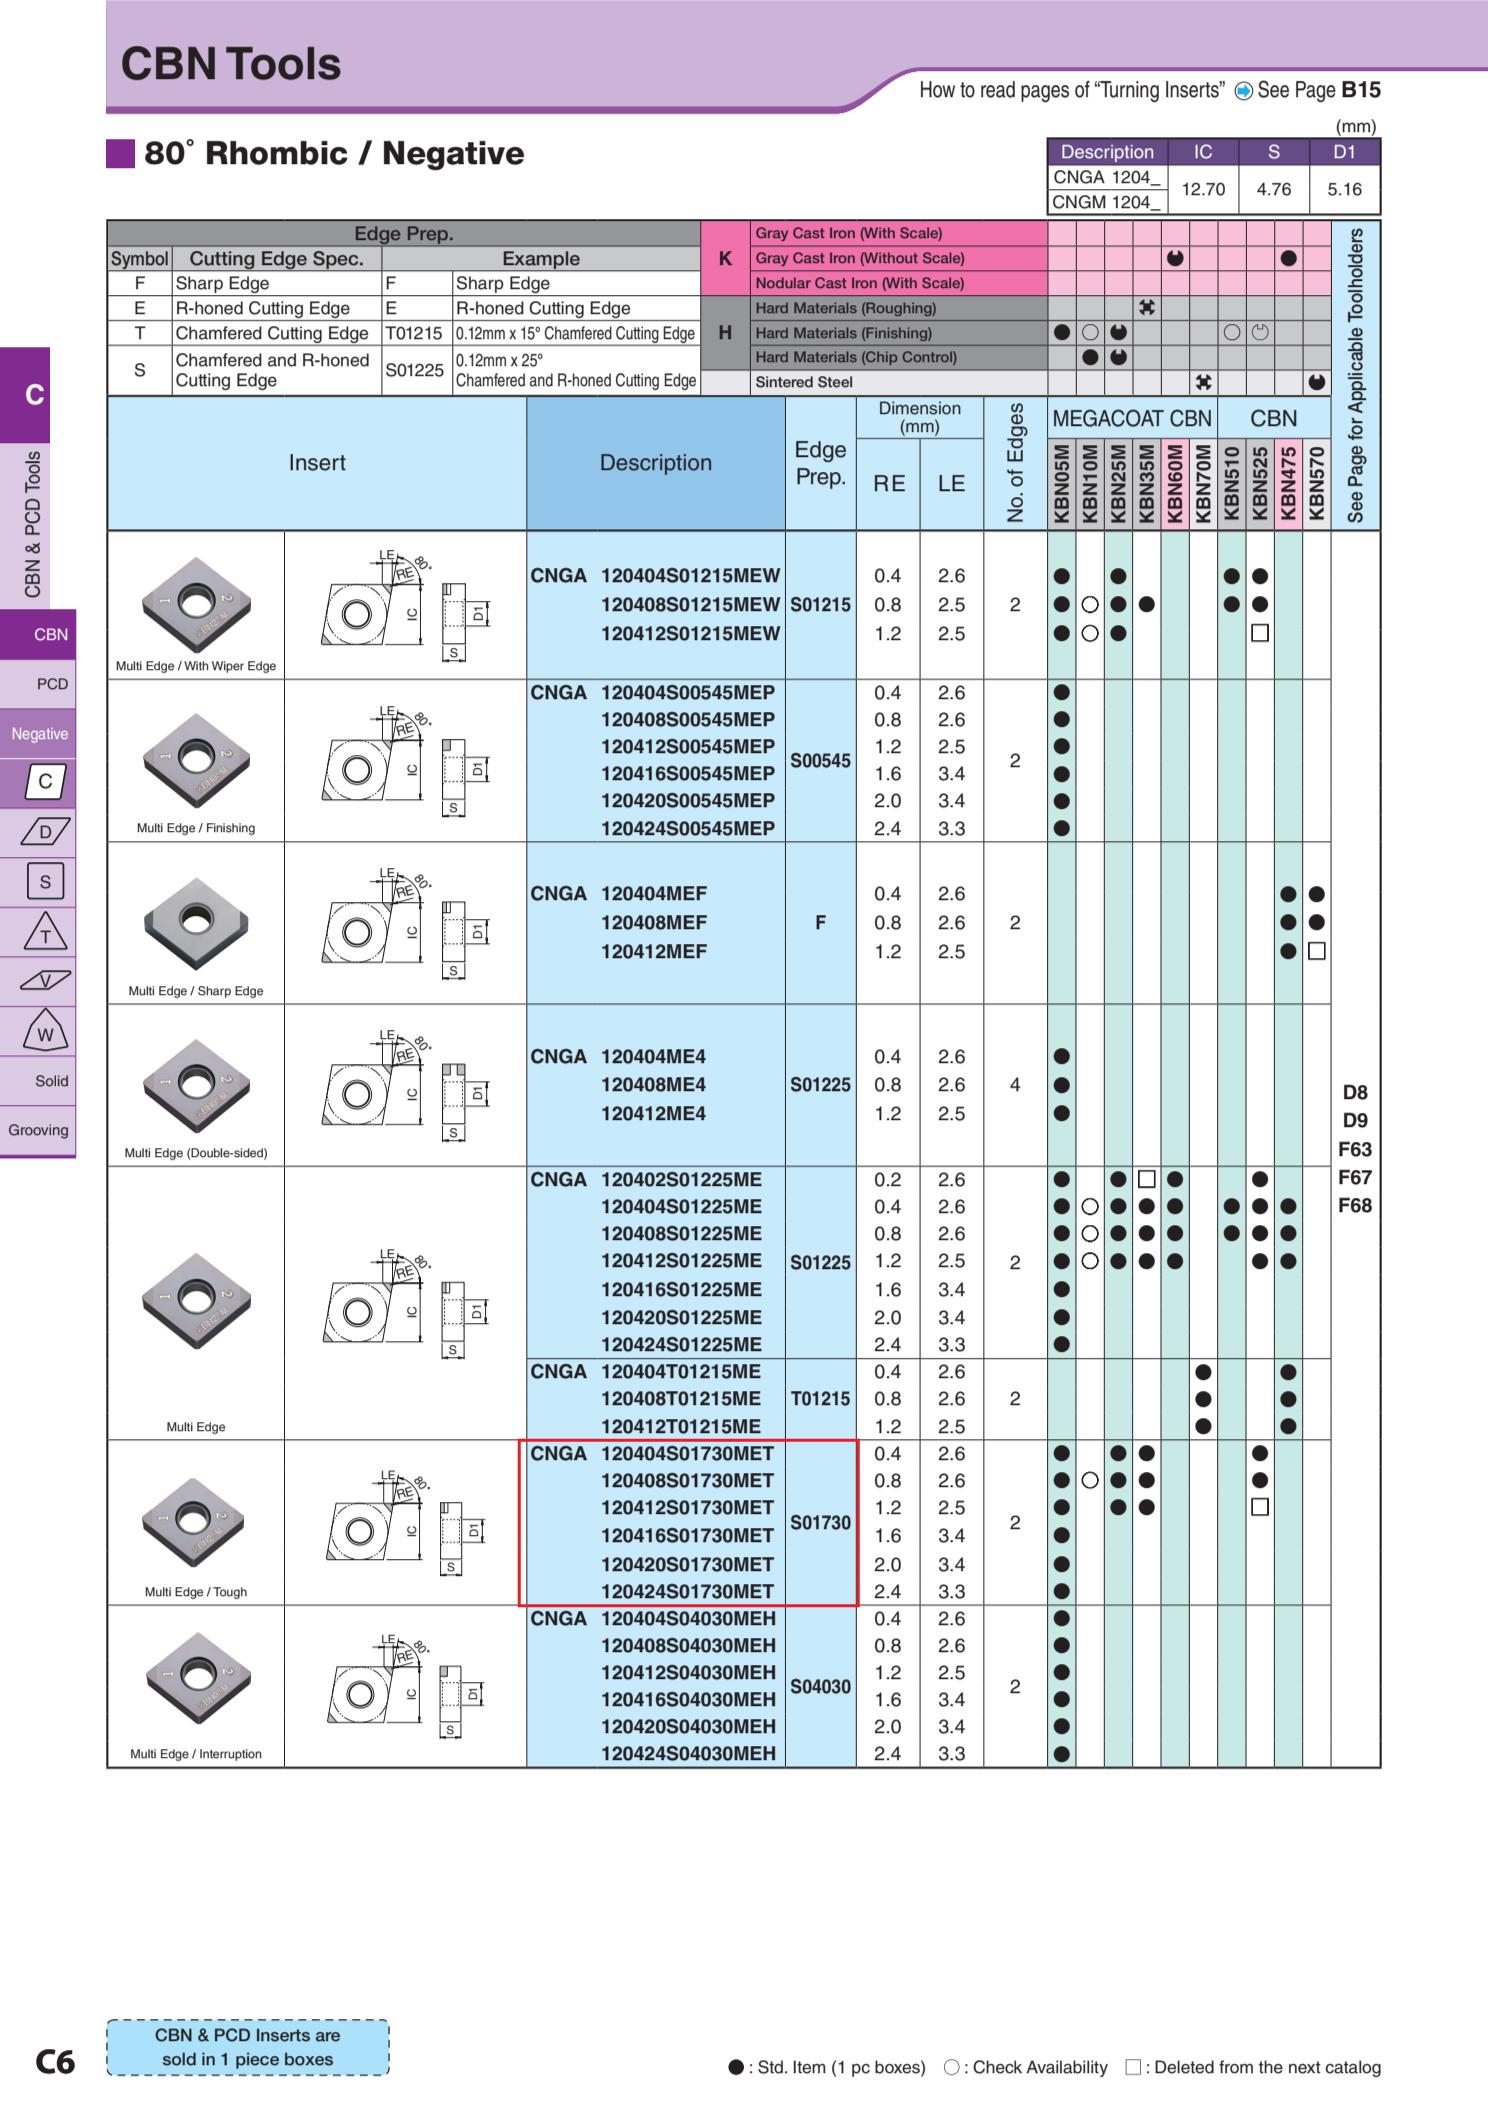 Mảnh Dao Tiện CBN Kyocera CNGA1204-S01730MET 1